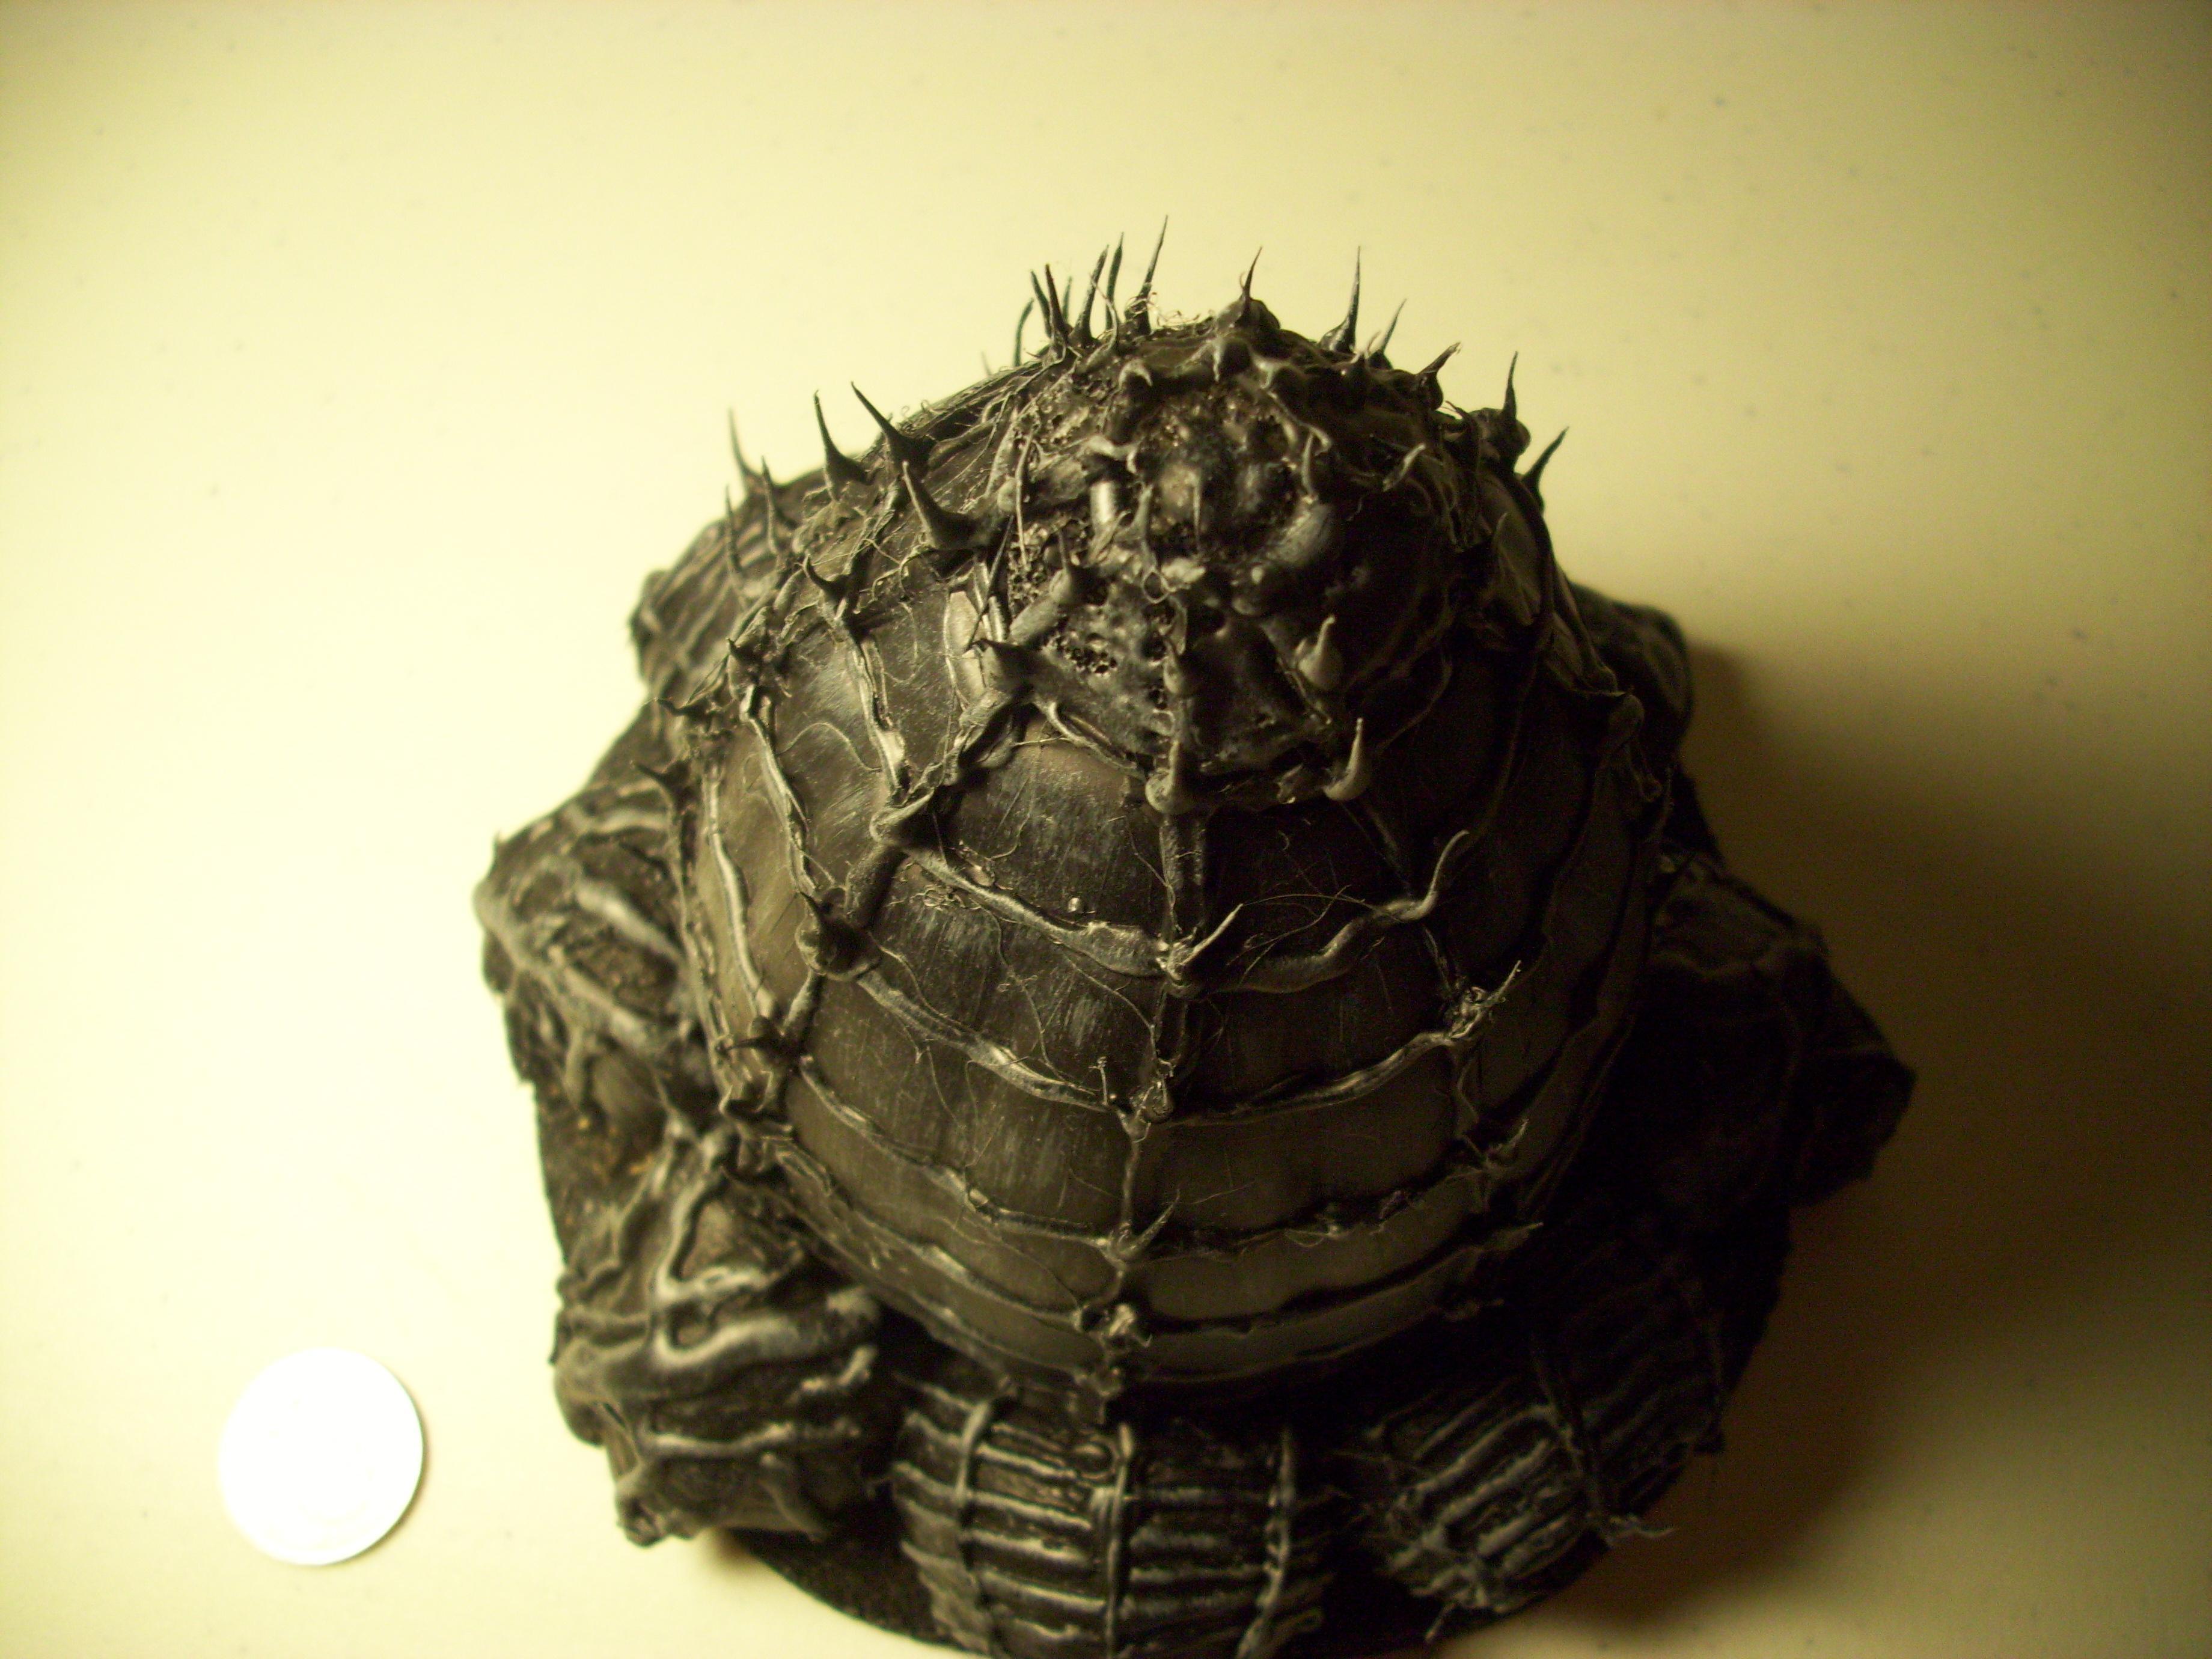 Alien, Egg, For Sale, Mycetic Spore, Pod, Spawn, Terrain, Tyranids, Undercoated, Unpainted